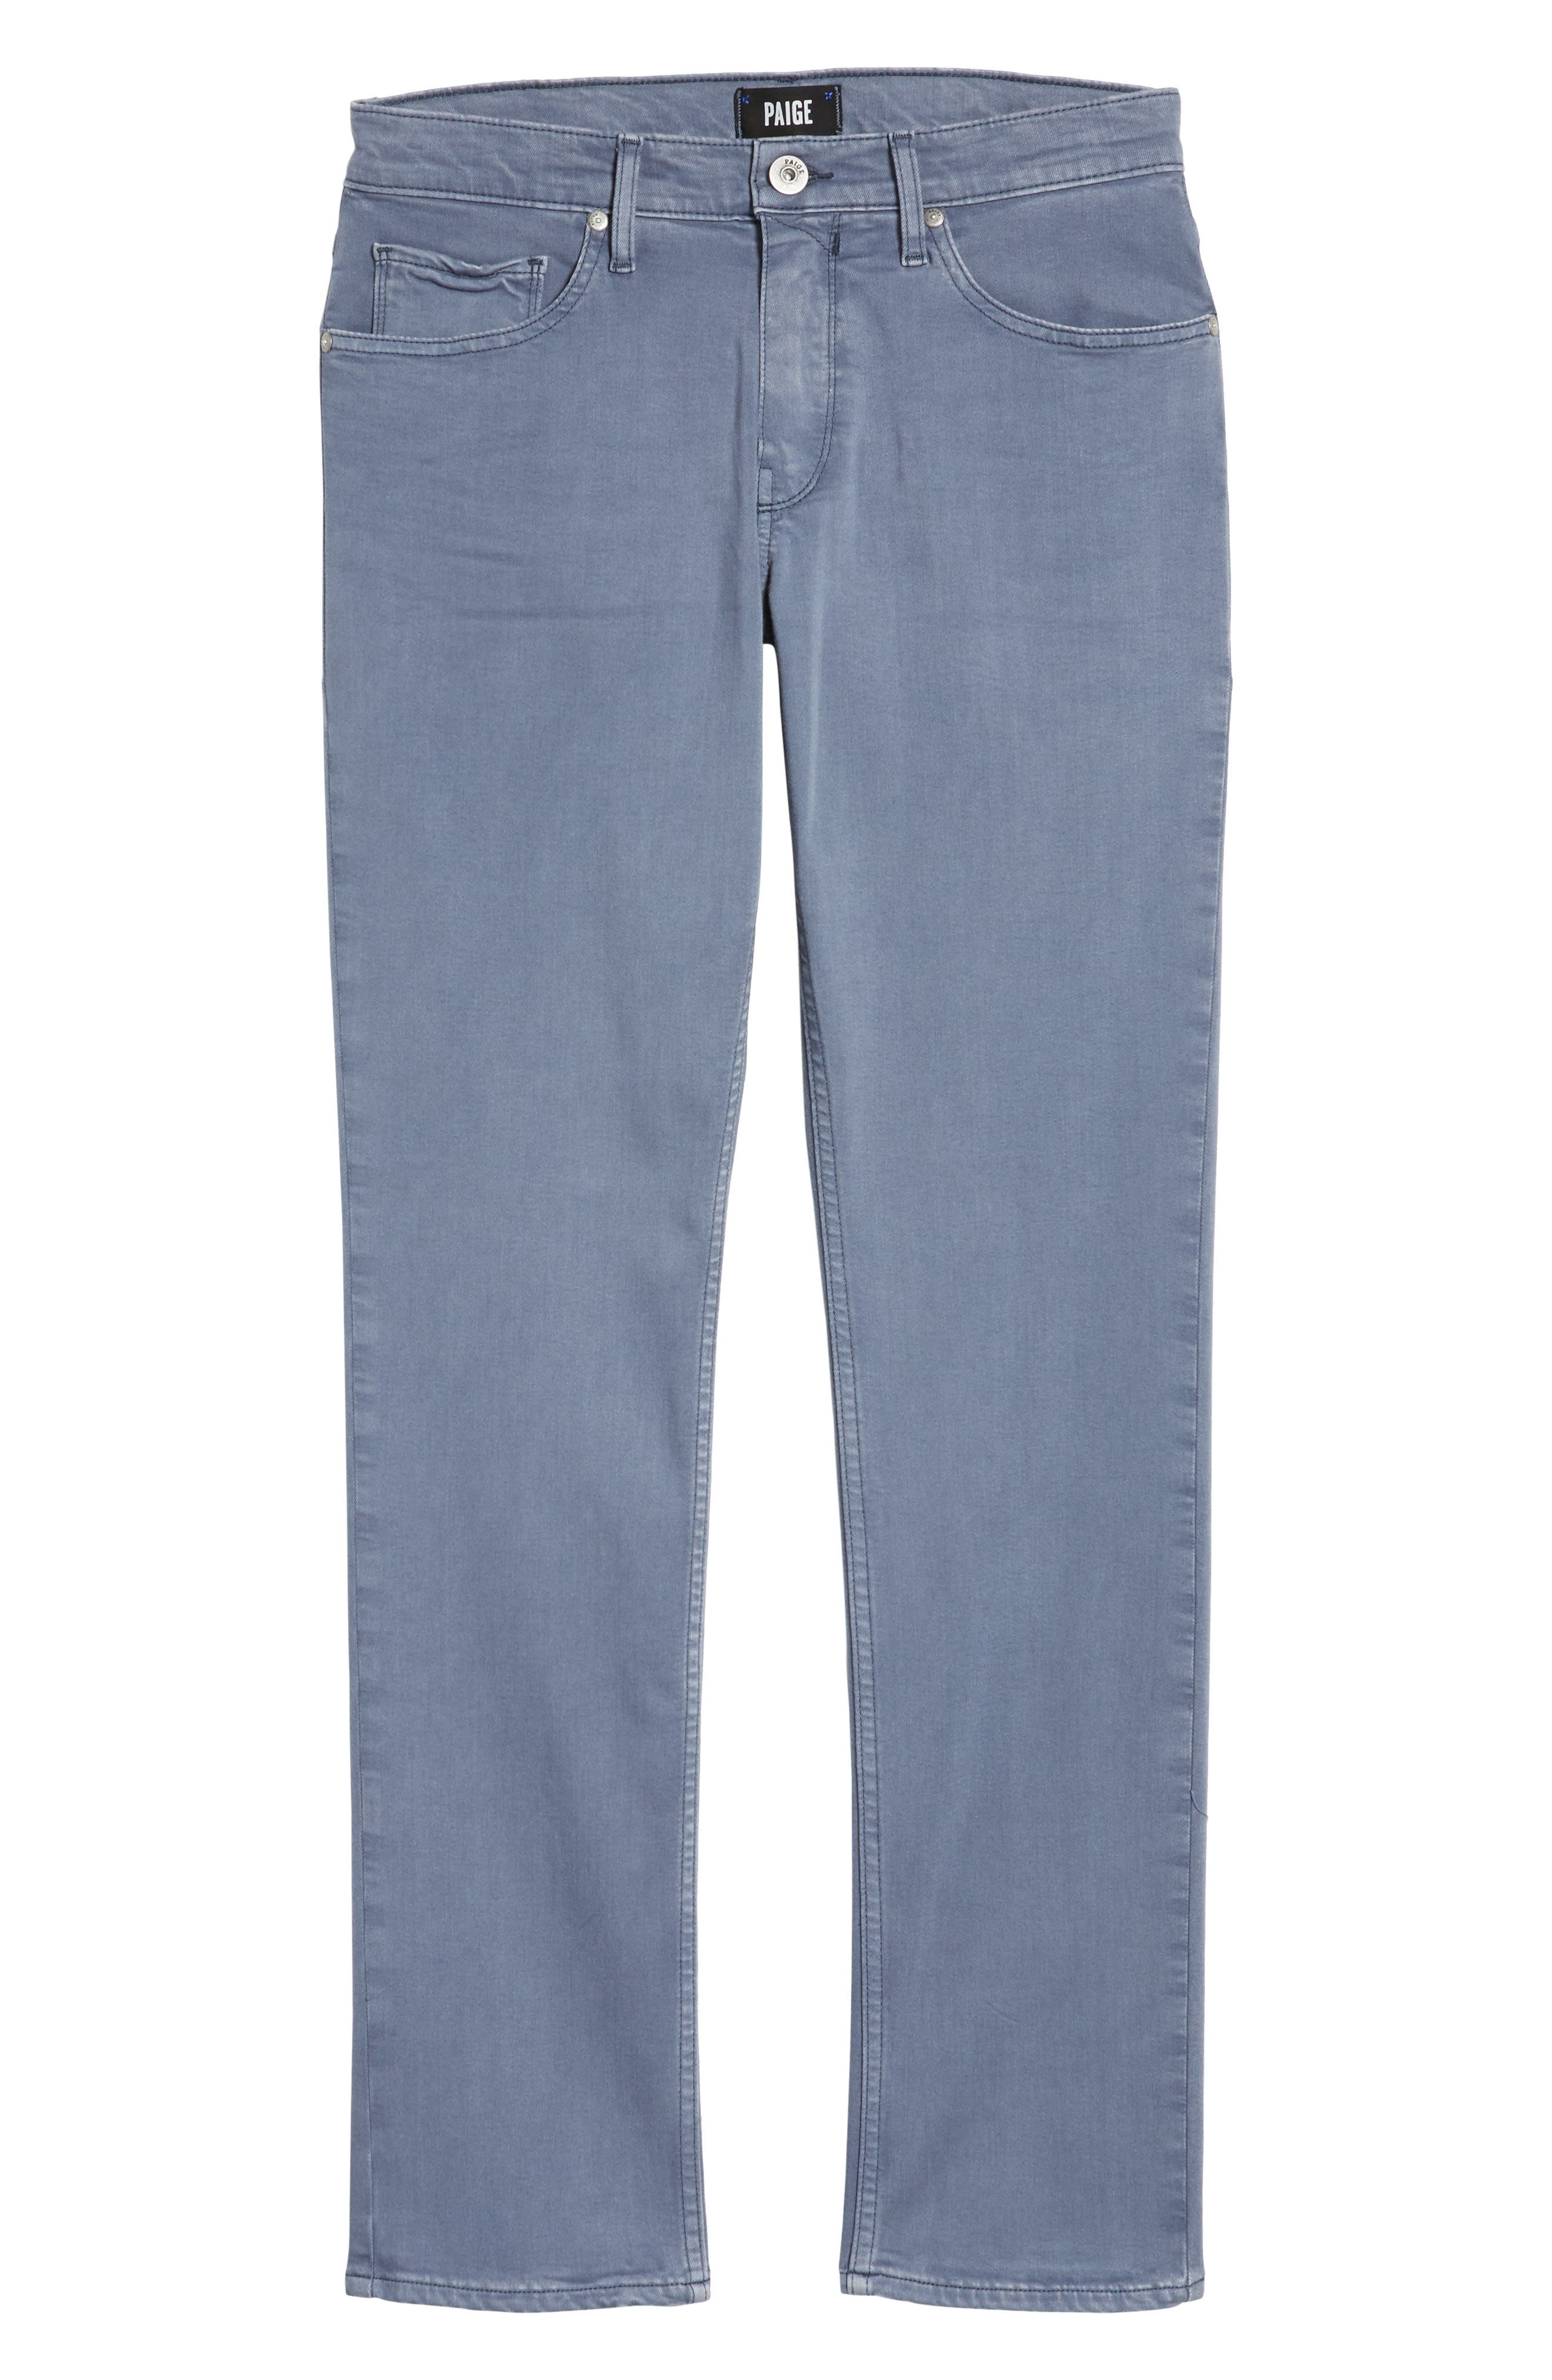 Transcend - Federal Slim Straight Leg Jeans,                             Alternate thumbnail 6, color,                             Vintage Smokey Blue